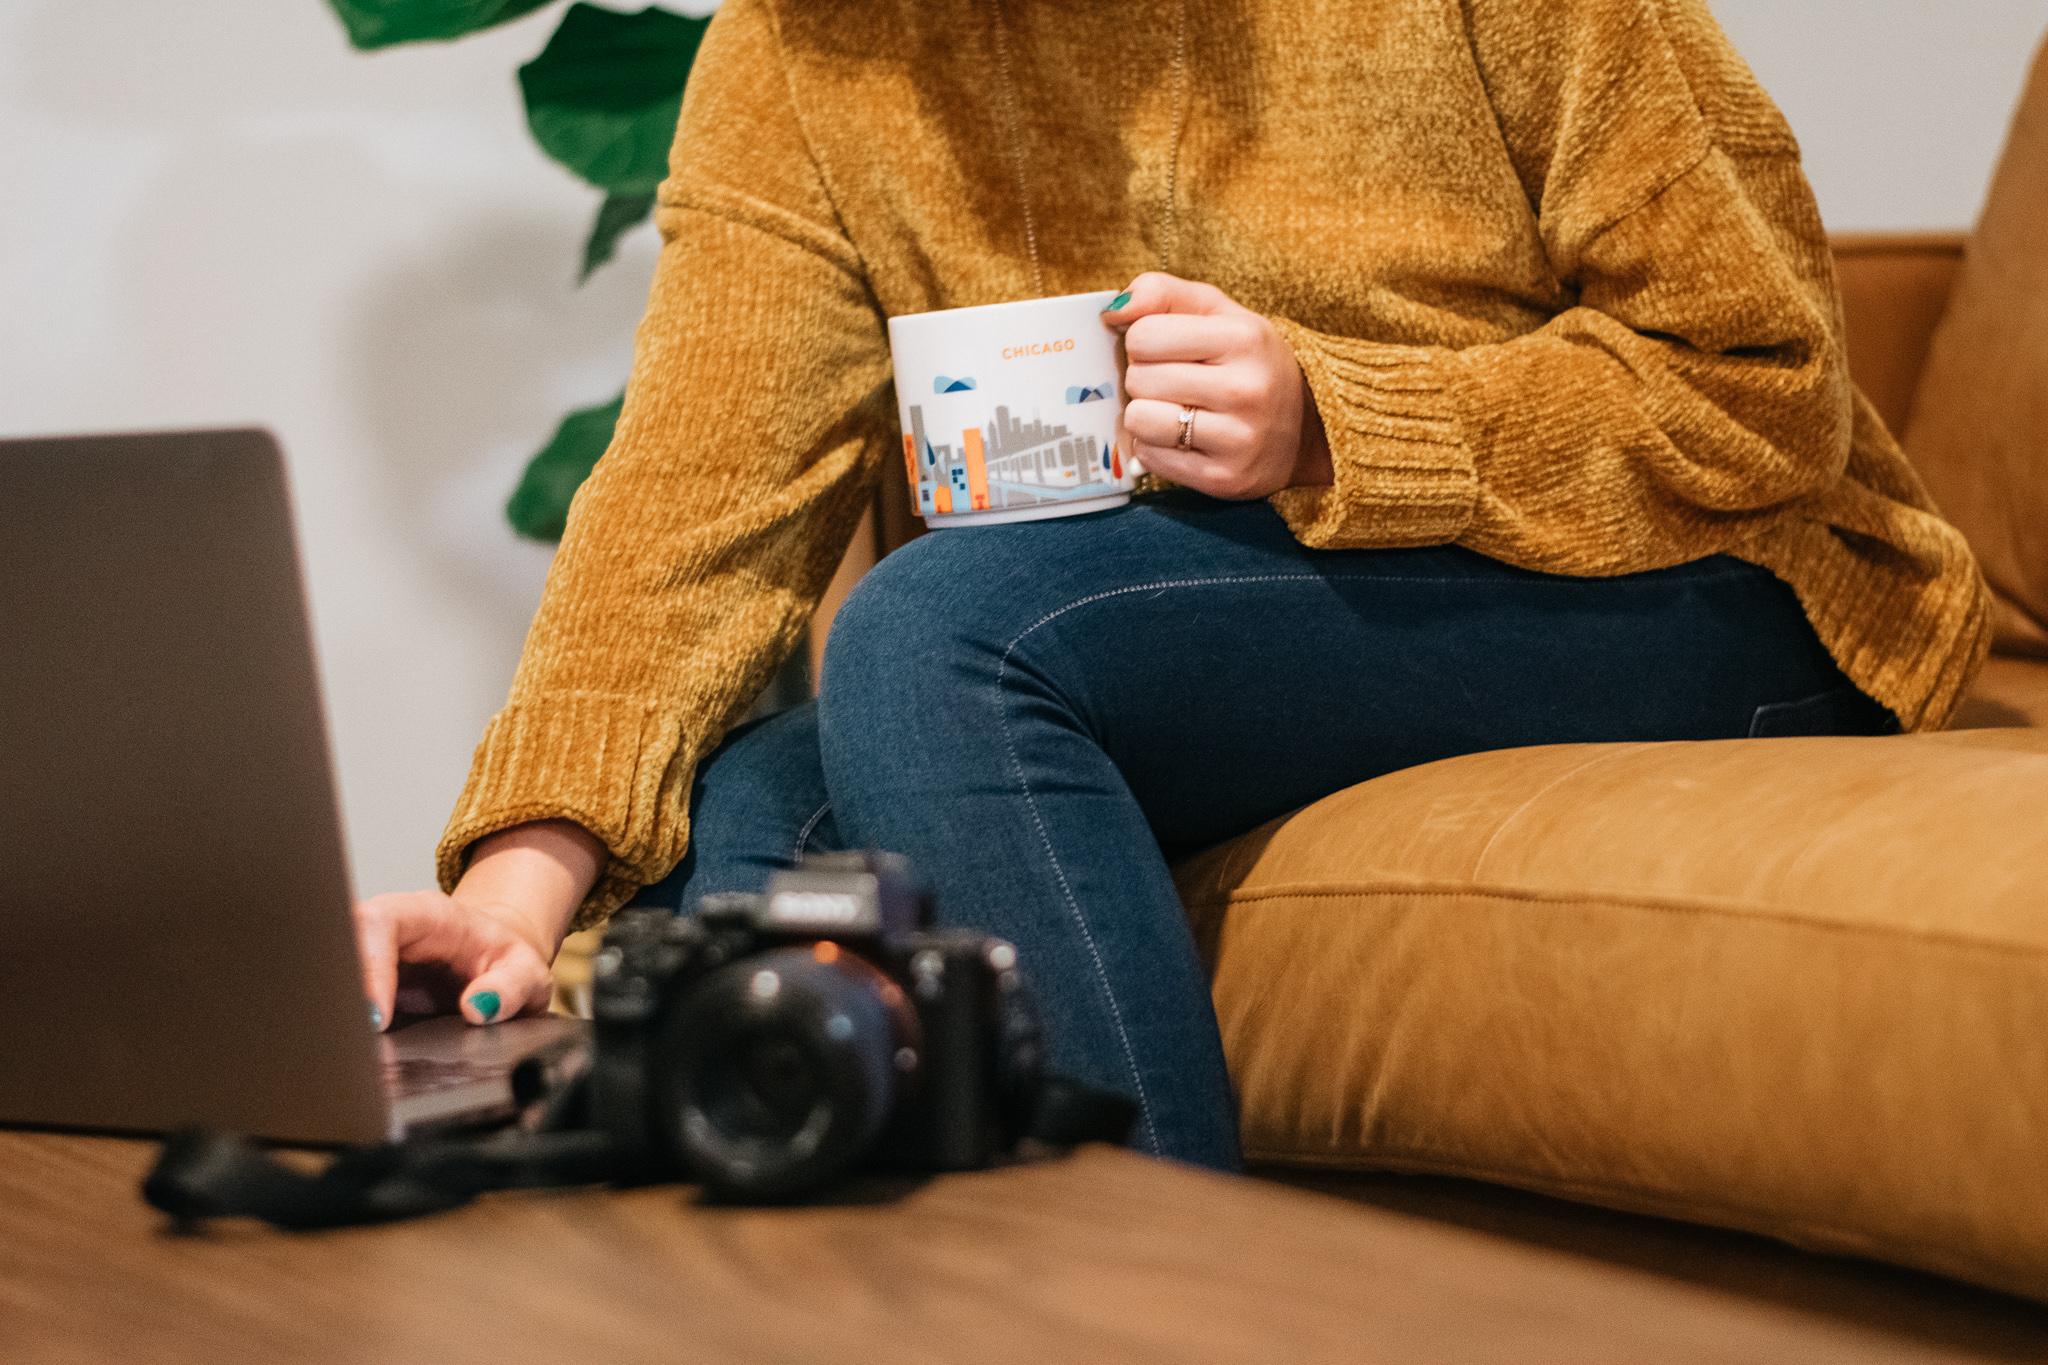 woman using computer holding mug